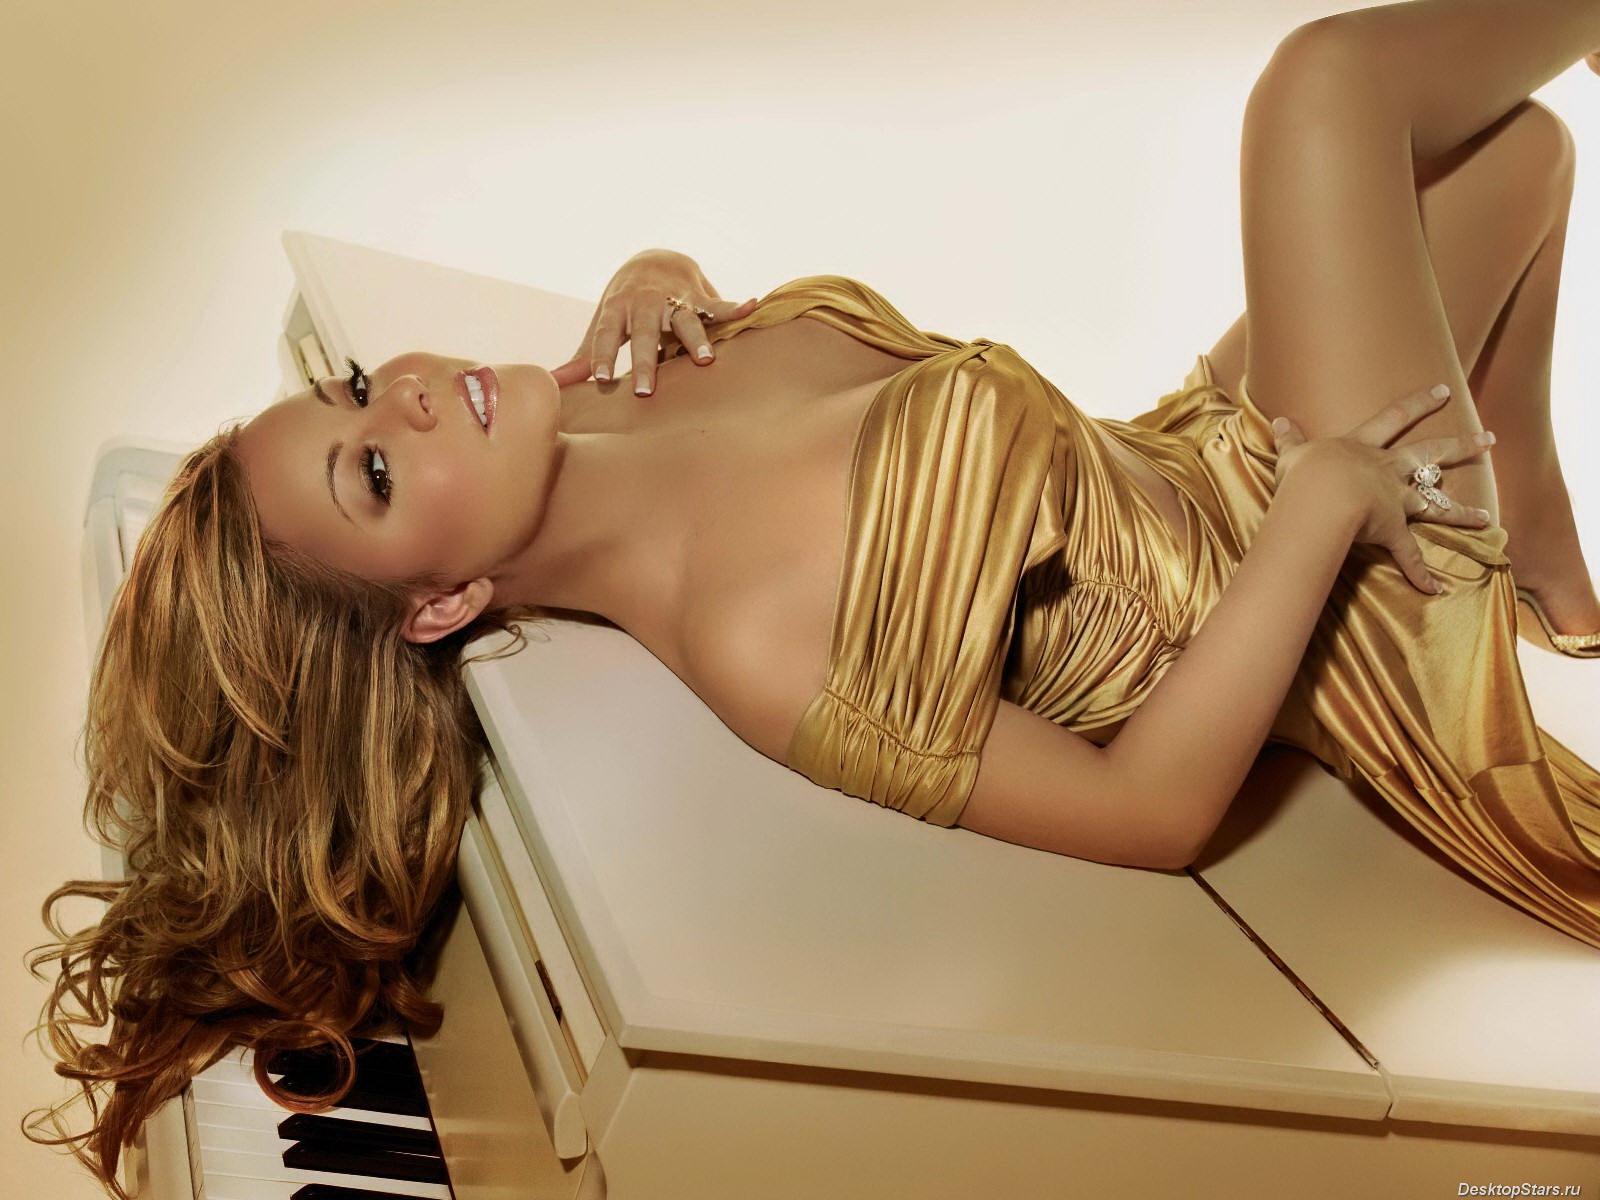 http://4.bp.blogspot.com/_dw2a3dWZPxo/TUVFos-EB2I/AAAAAAAAJWQ/IY_wN57UOs0/s1600/Mariah-Carey-1600x1200-036.jpg